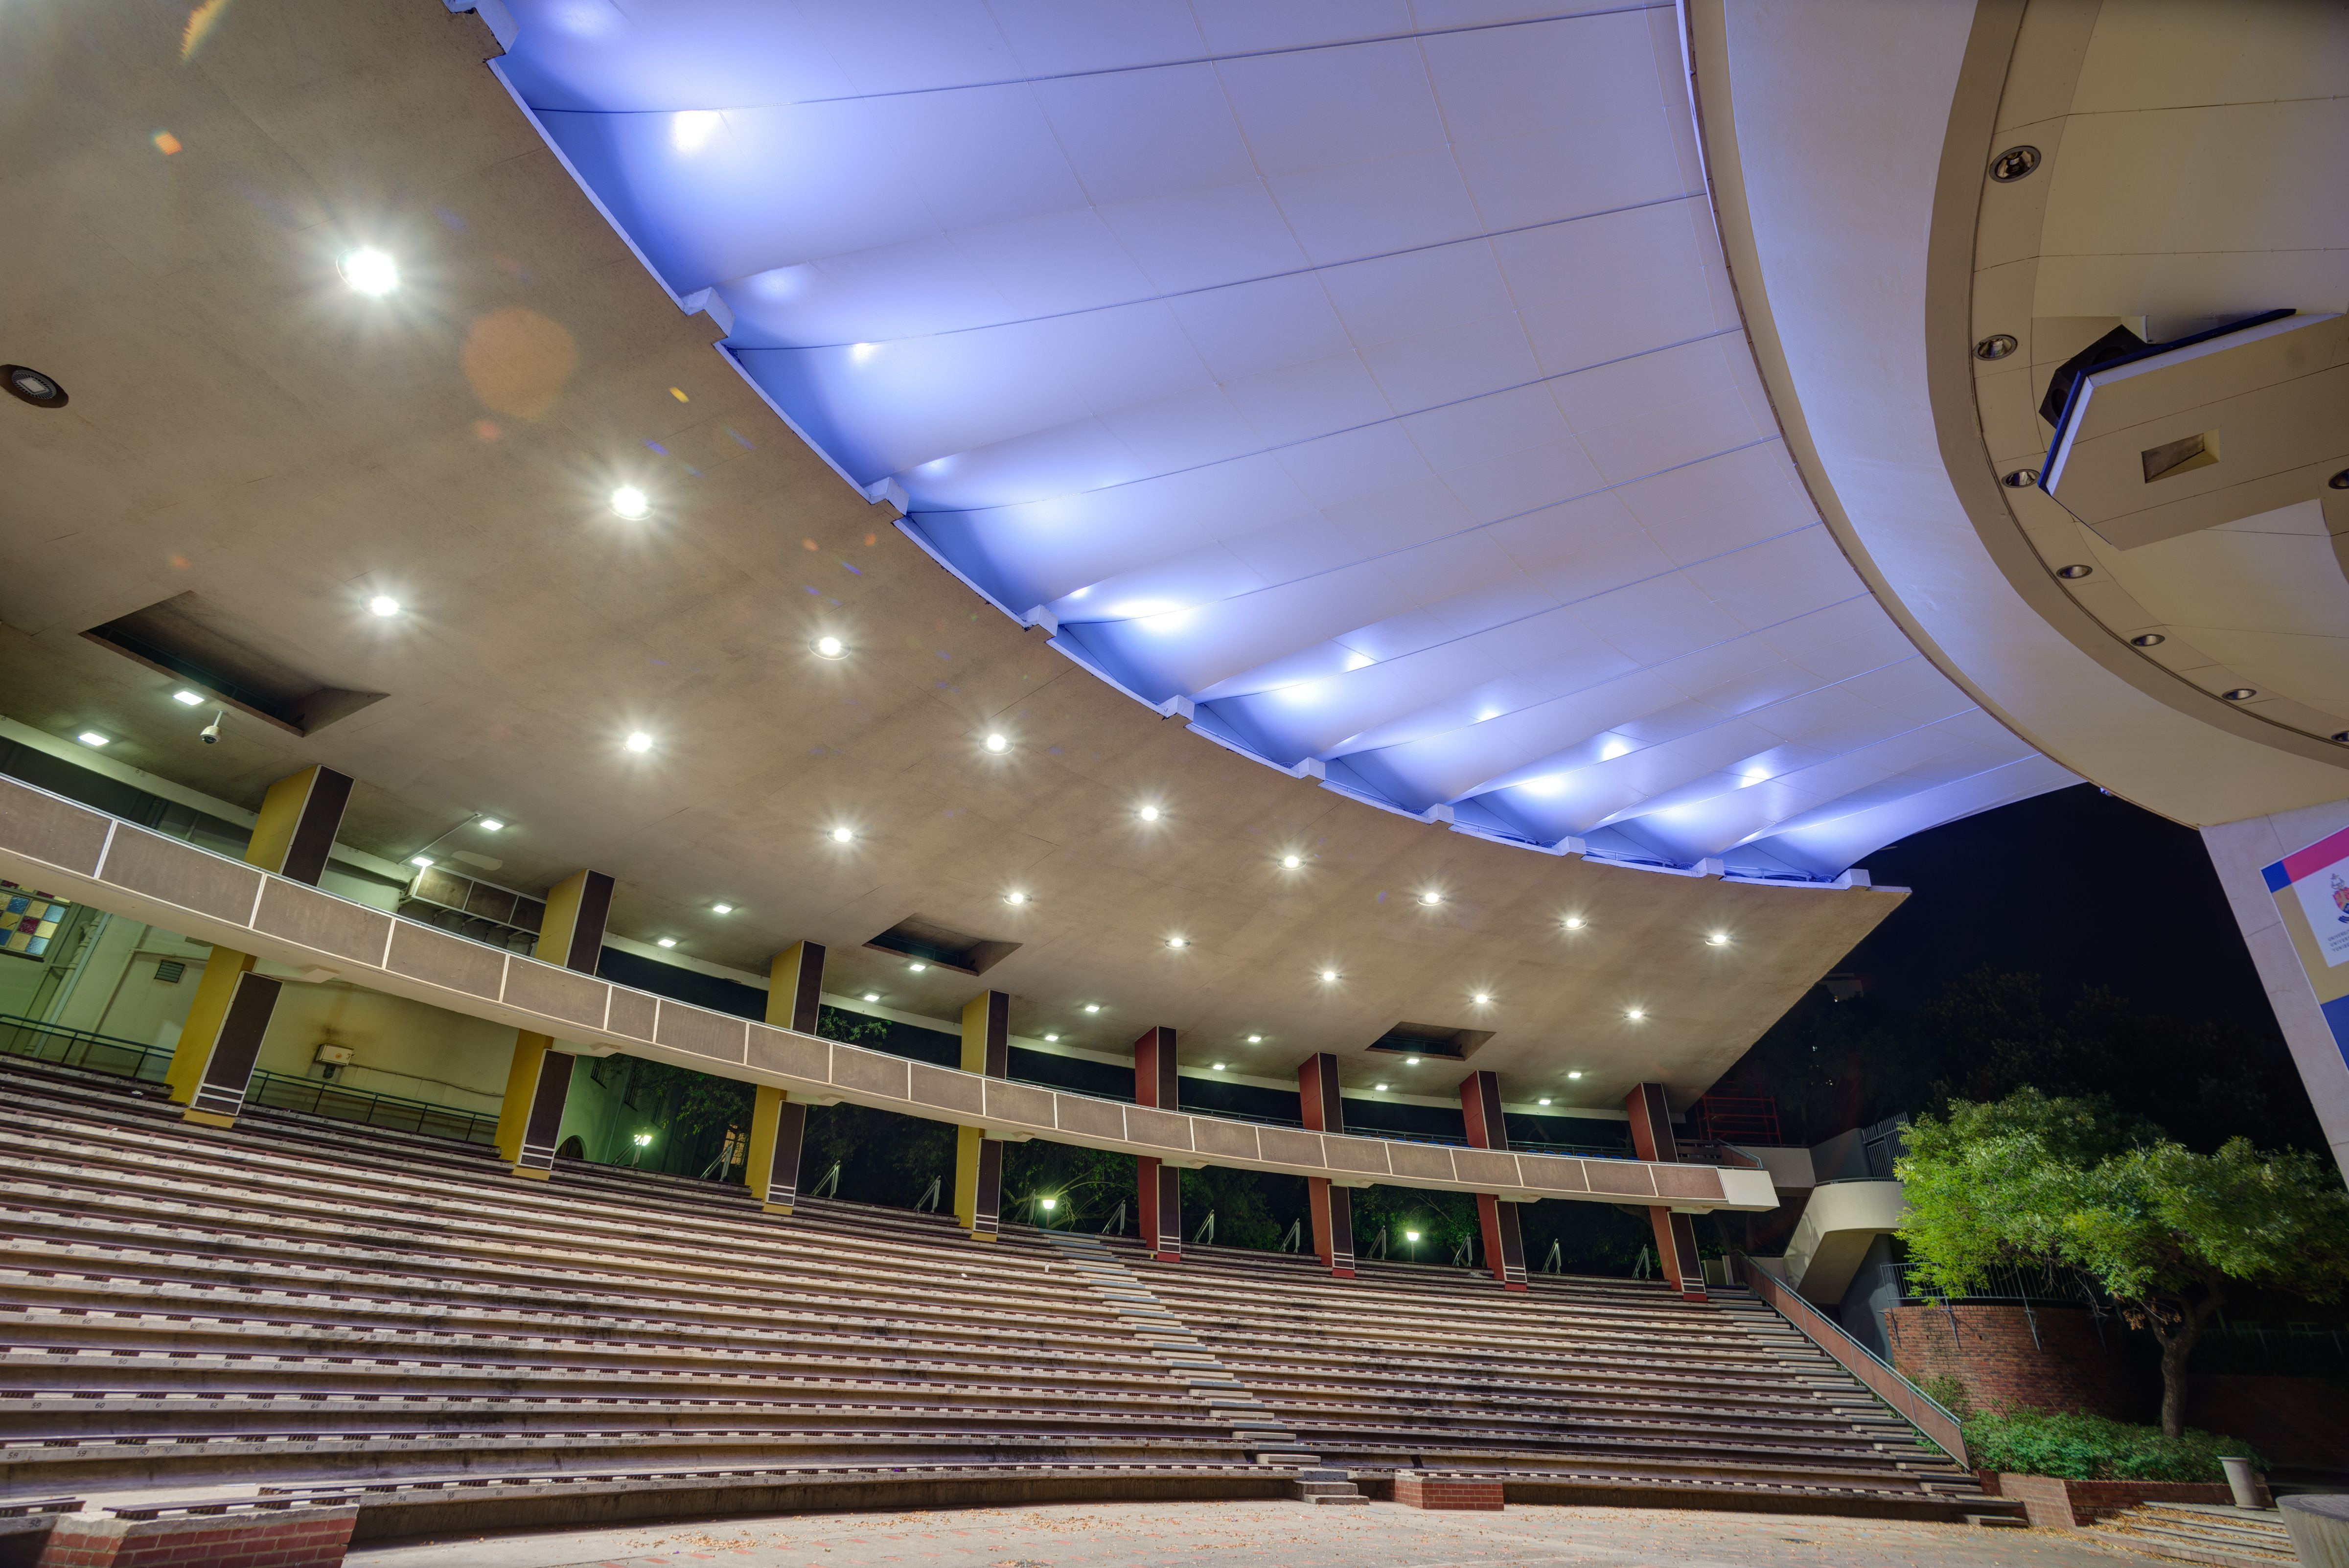 Amphitheatre Design At University Of Pretoria With The